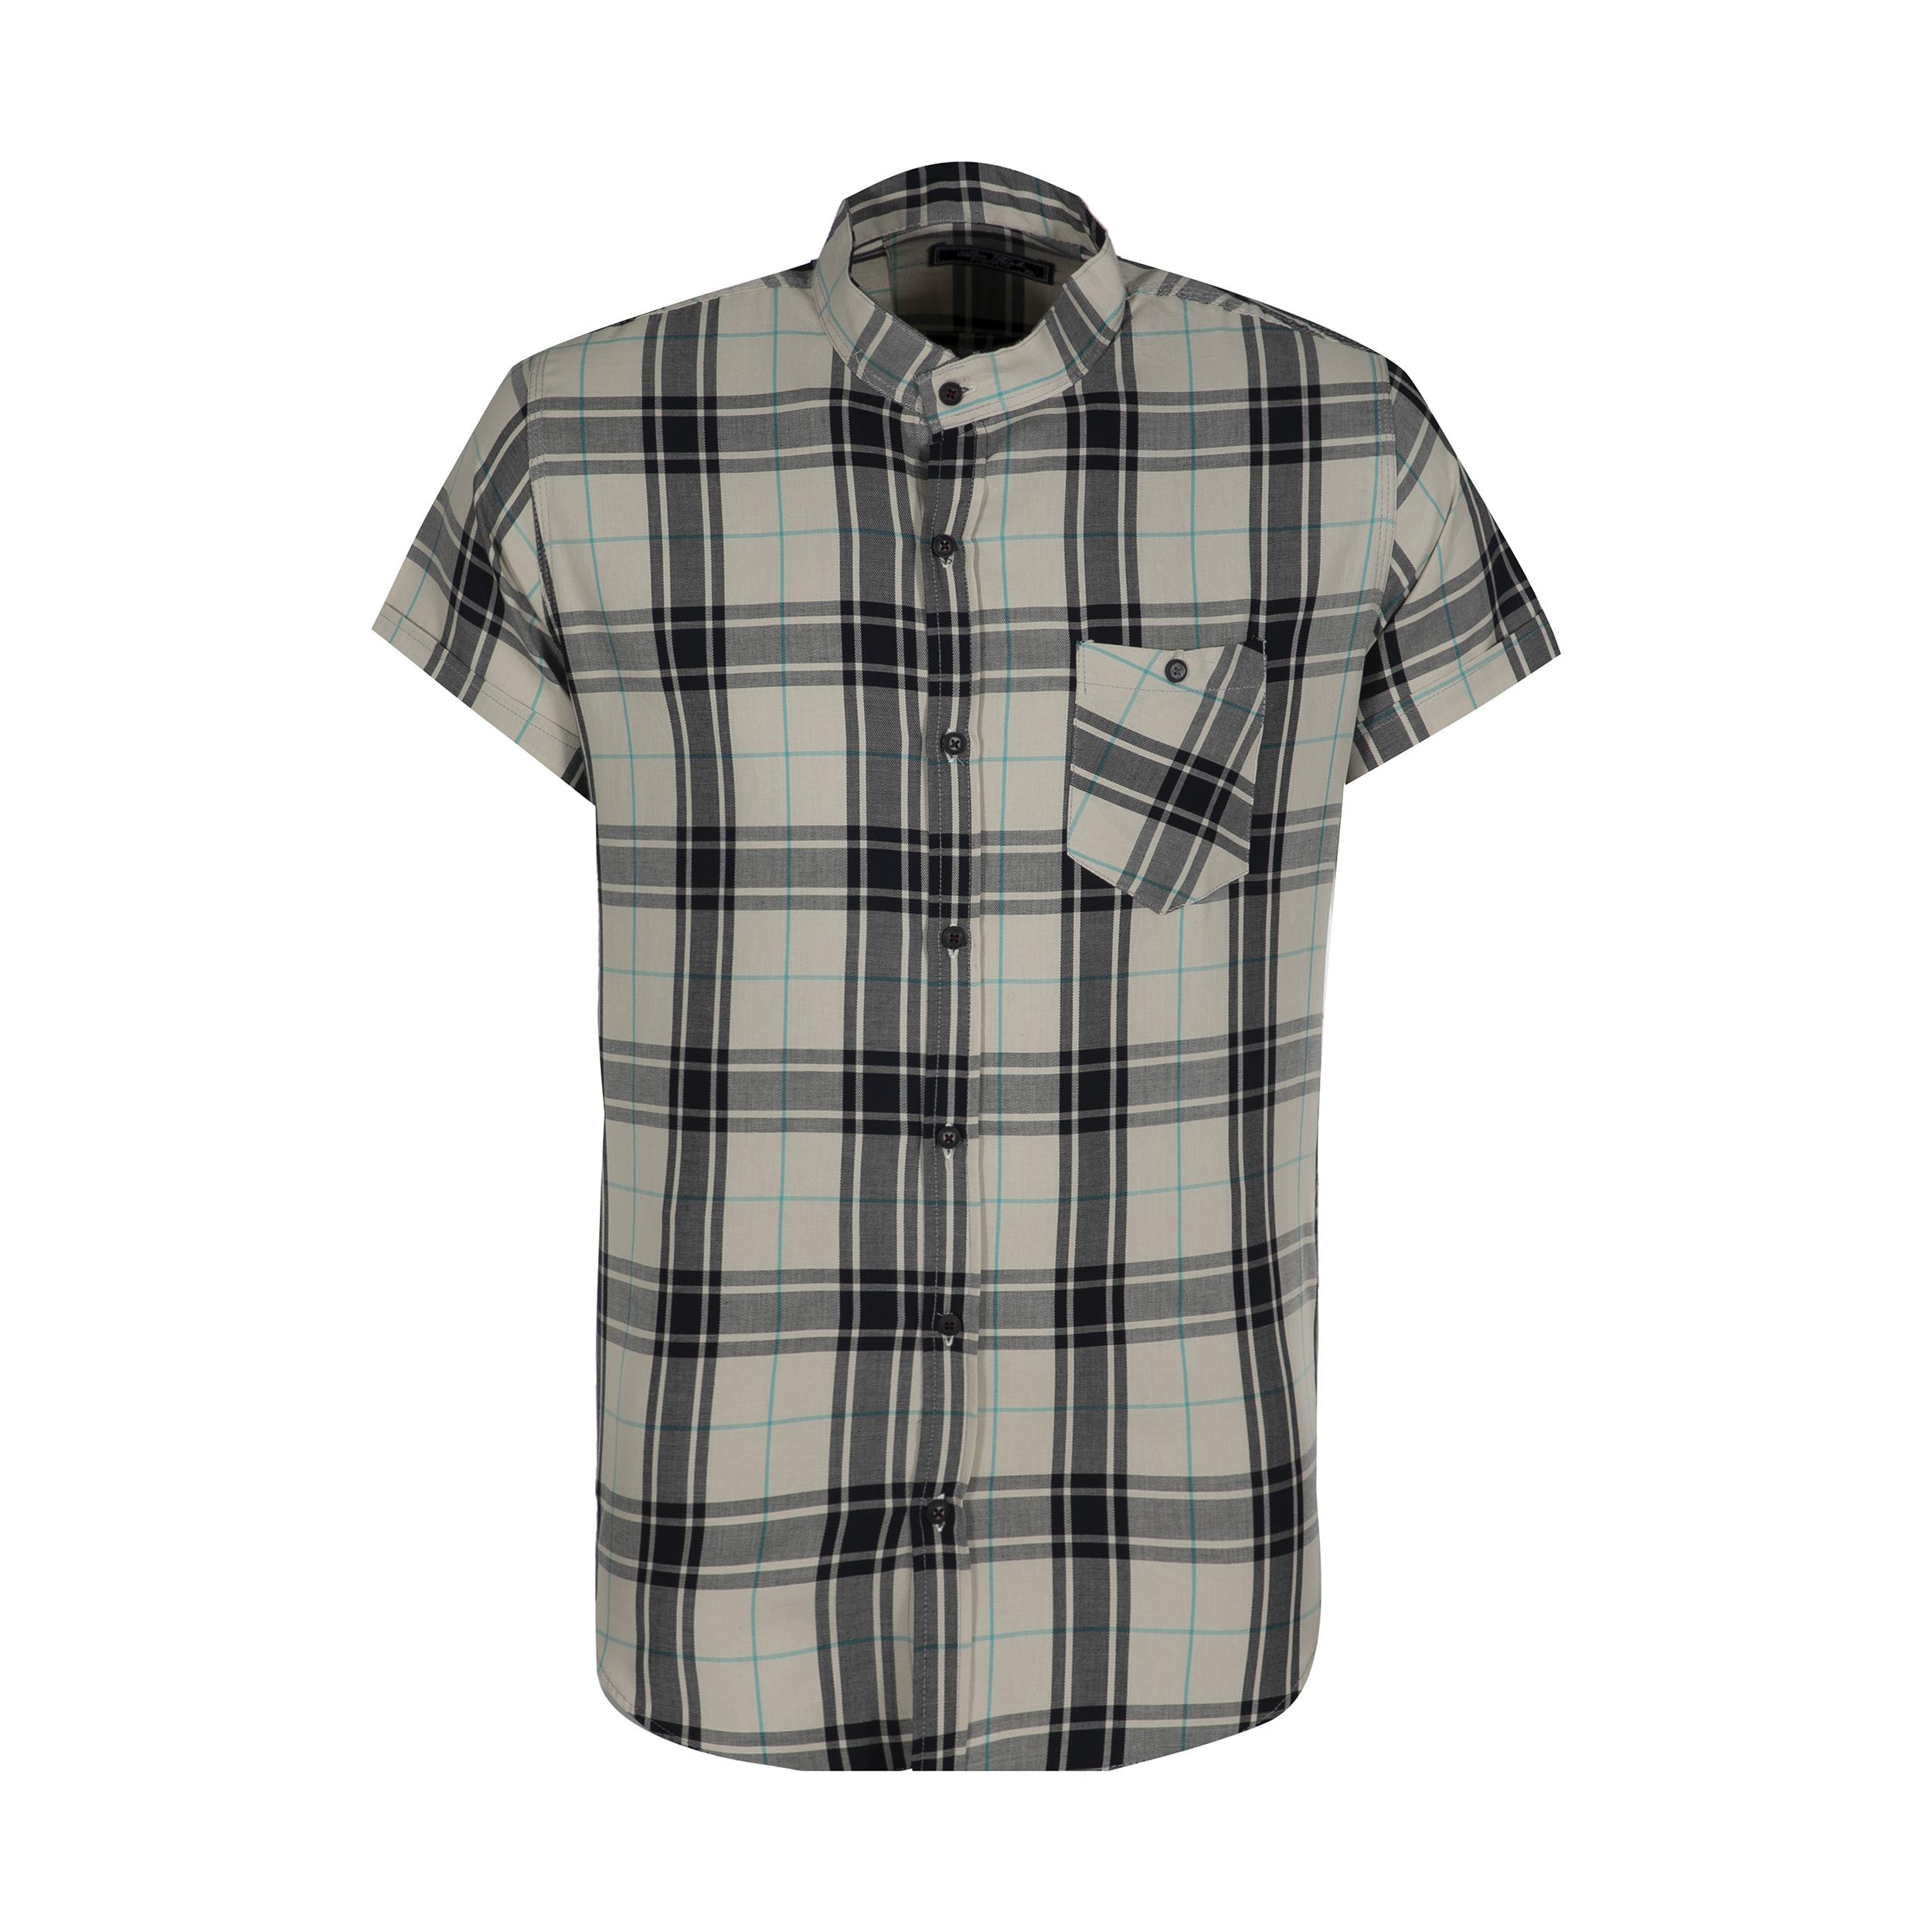 پیراهن مردانه کد 666-2